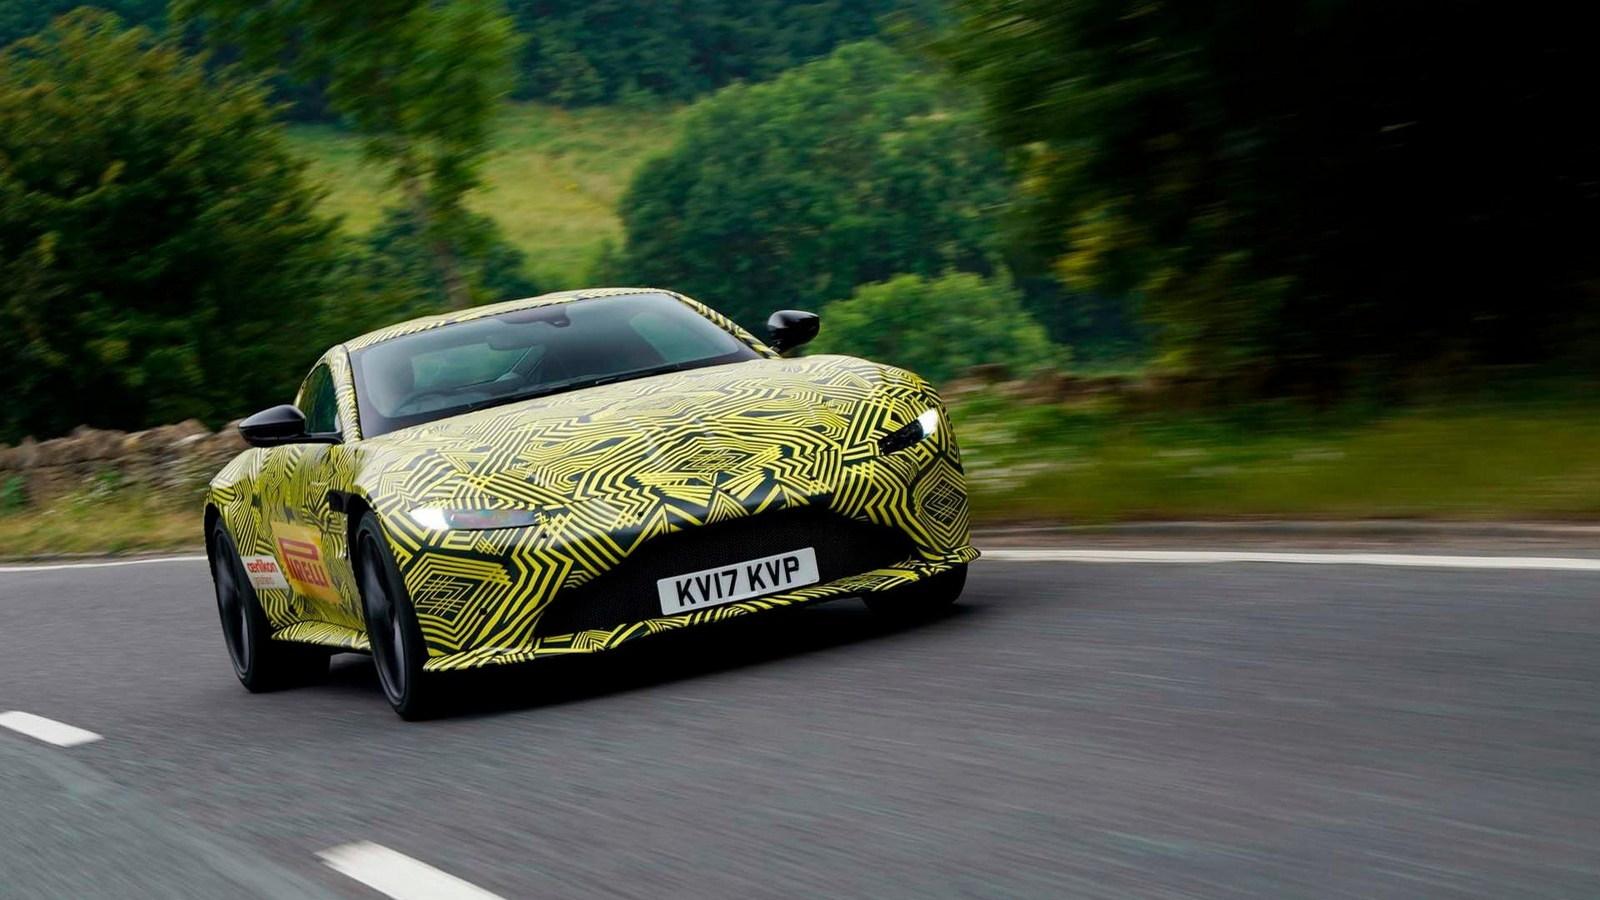 Teaser for 2018 Aston Martin Vantage